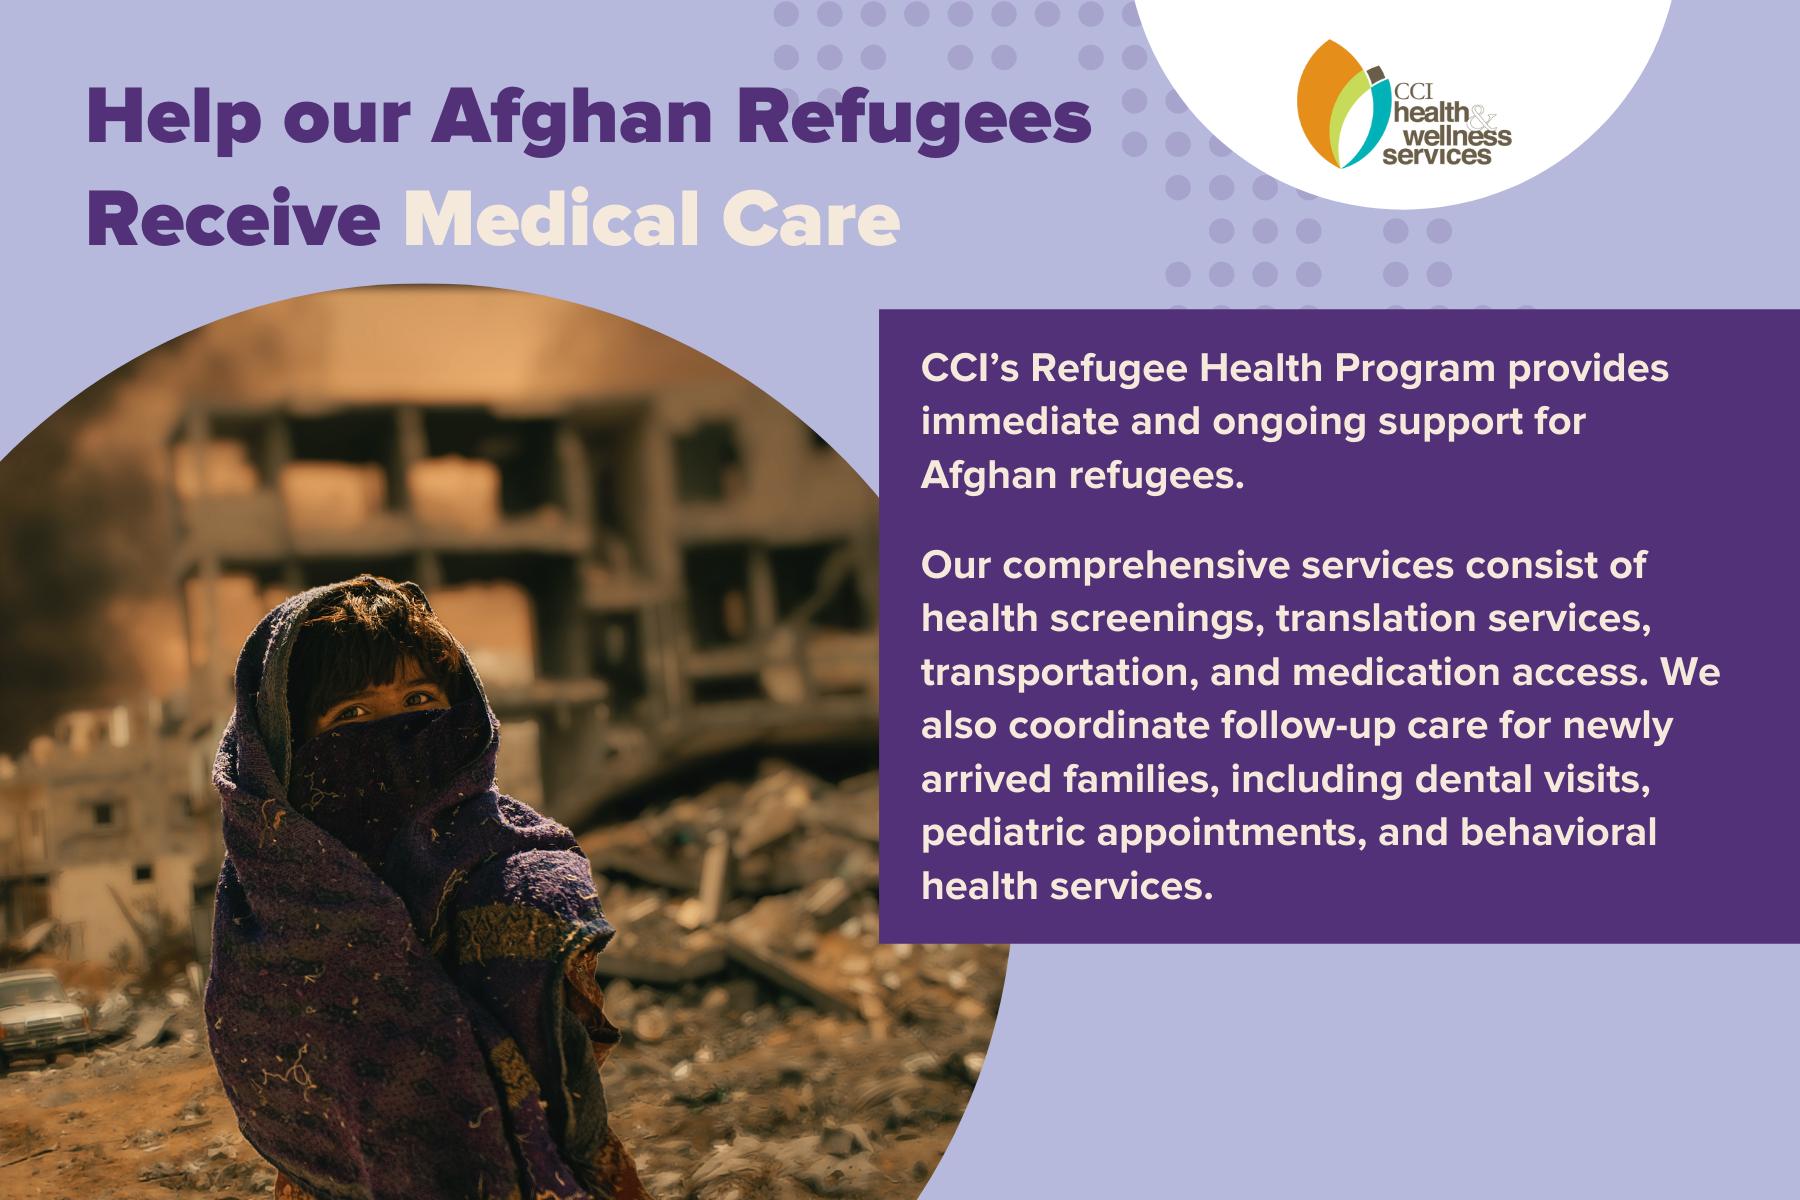 CCI Refugee Health